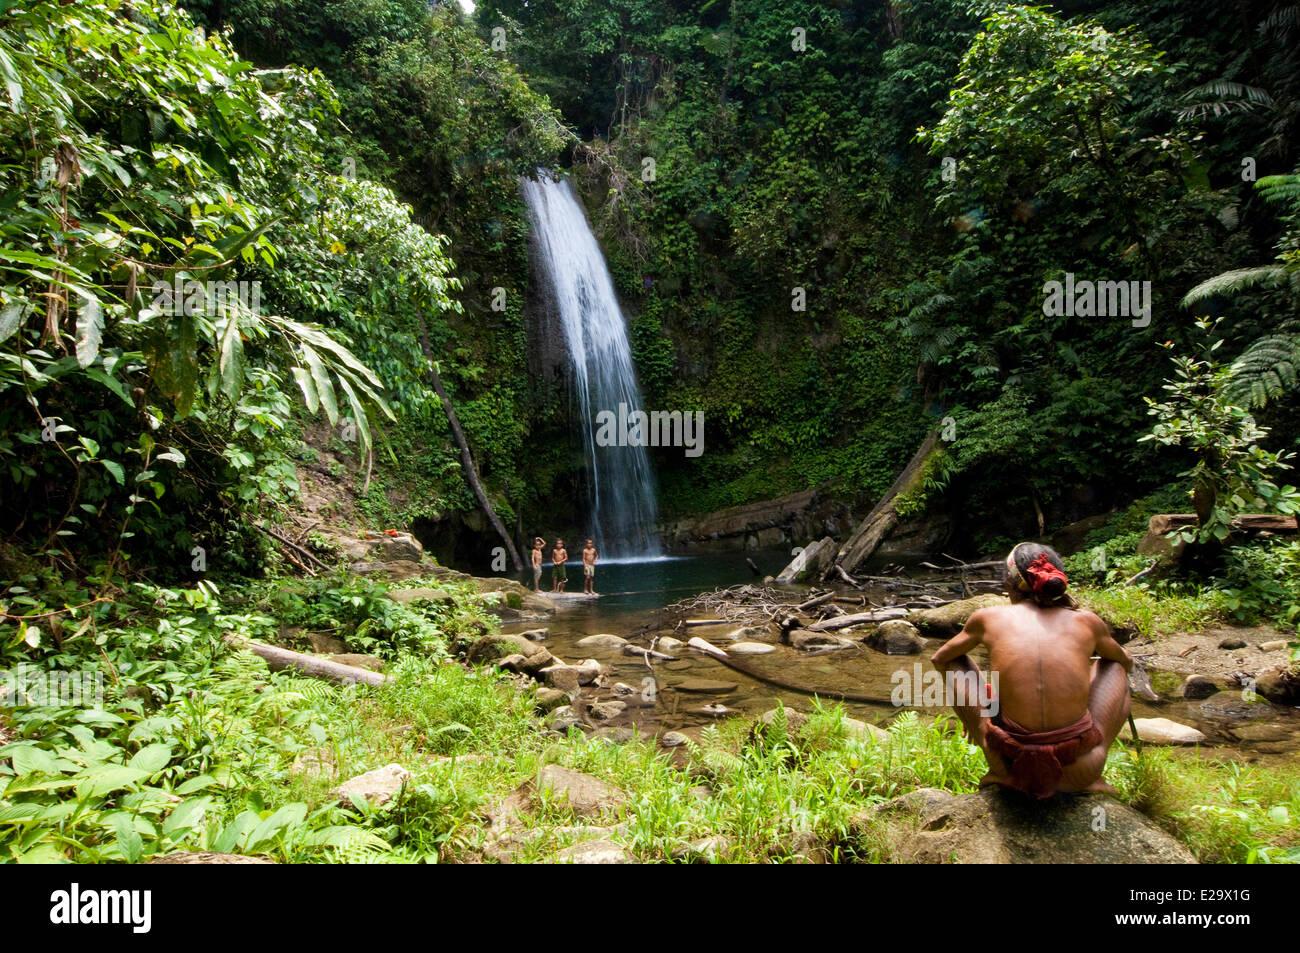 Indonesia, Sumatra, Siberut, with the Mentawai, or Flower People - Stock Image